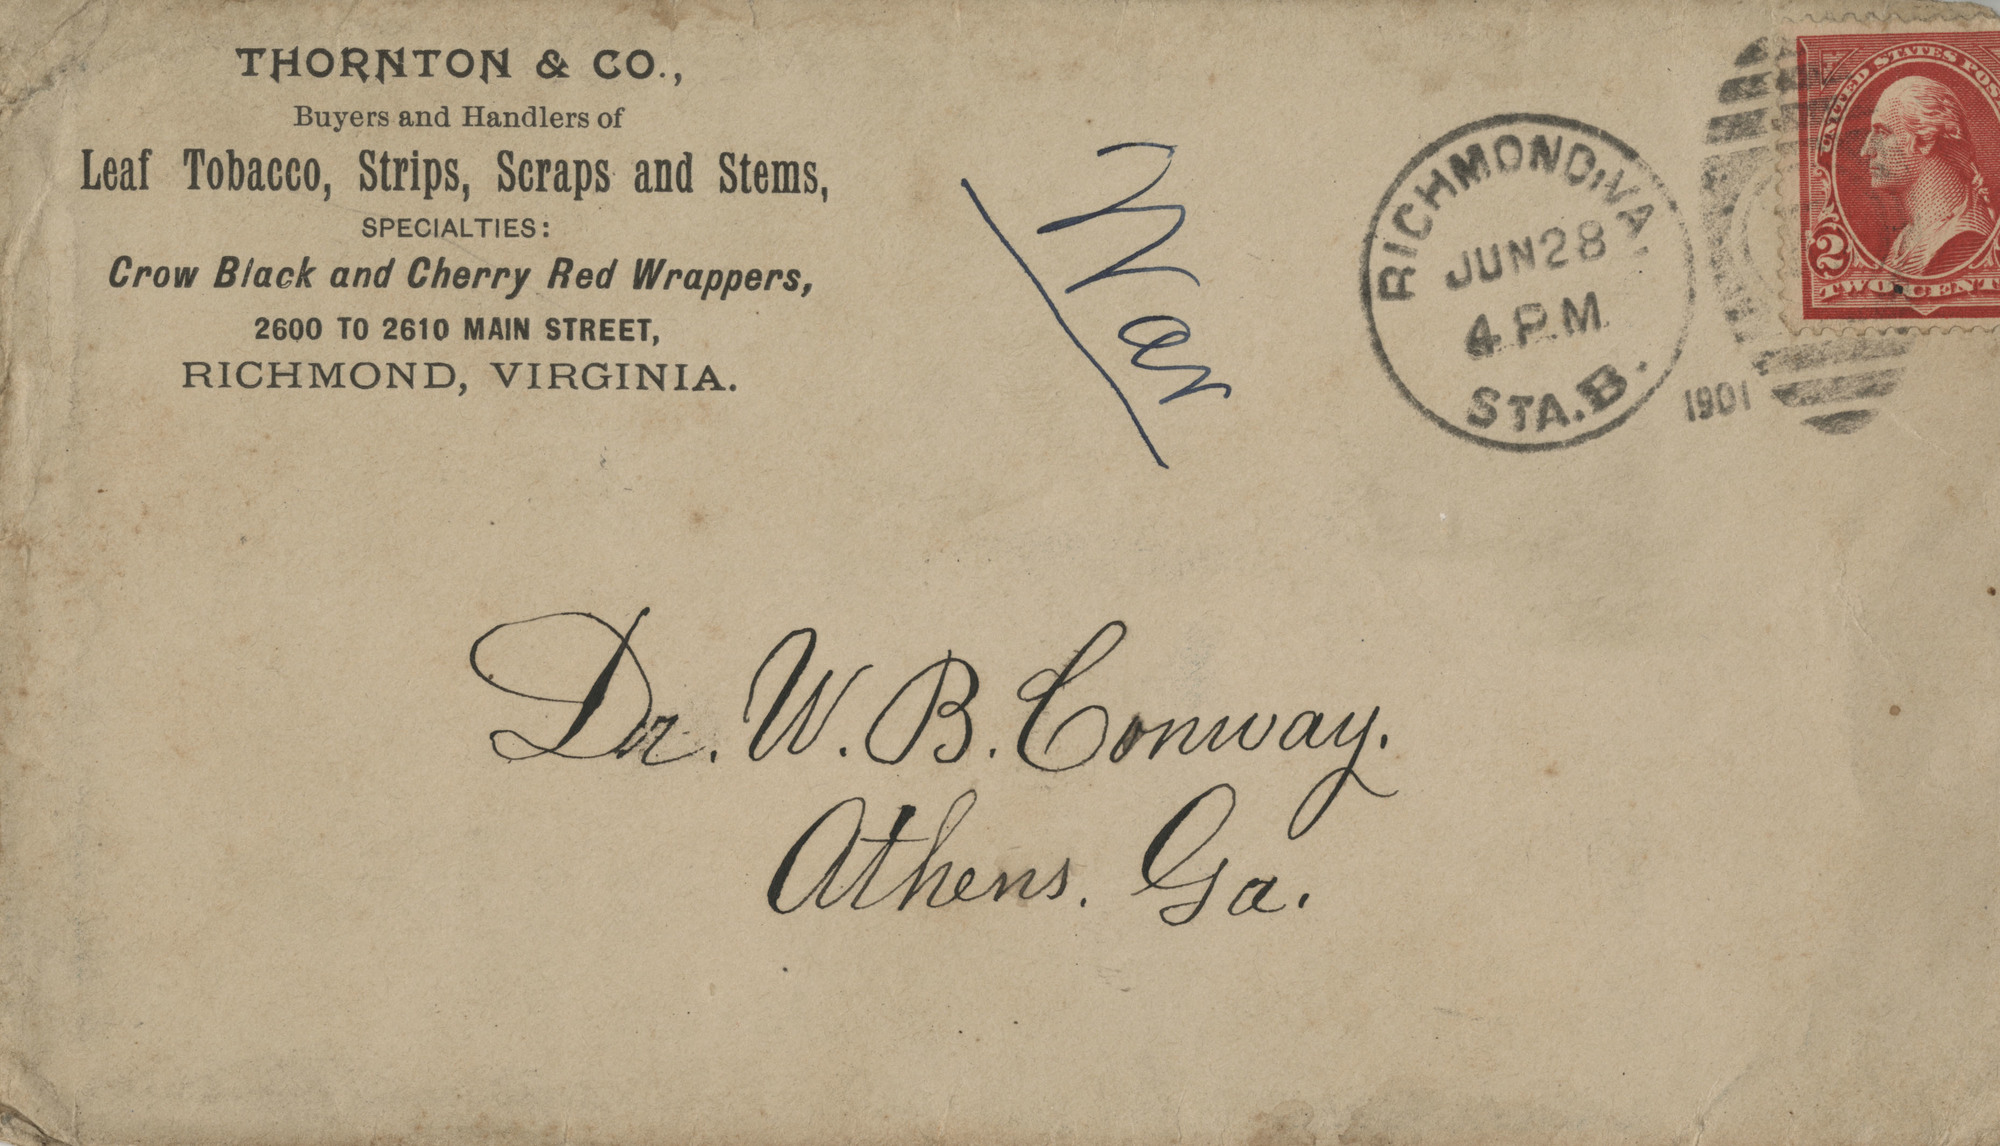 http://spec.lib.vt.edu/pickup/Omeka_upload/Ms2012-039_ConwayCatlett_F3_Letter_1901_0628_enva.jpg